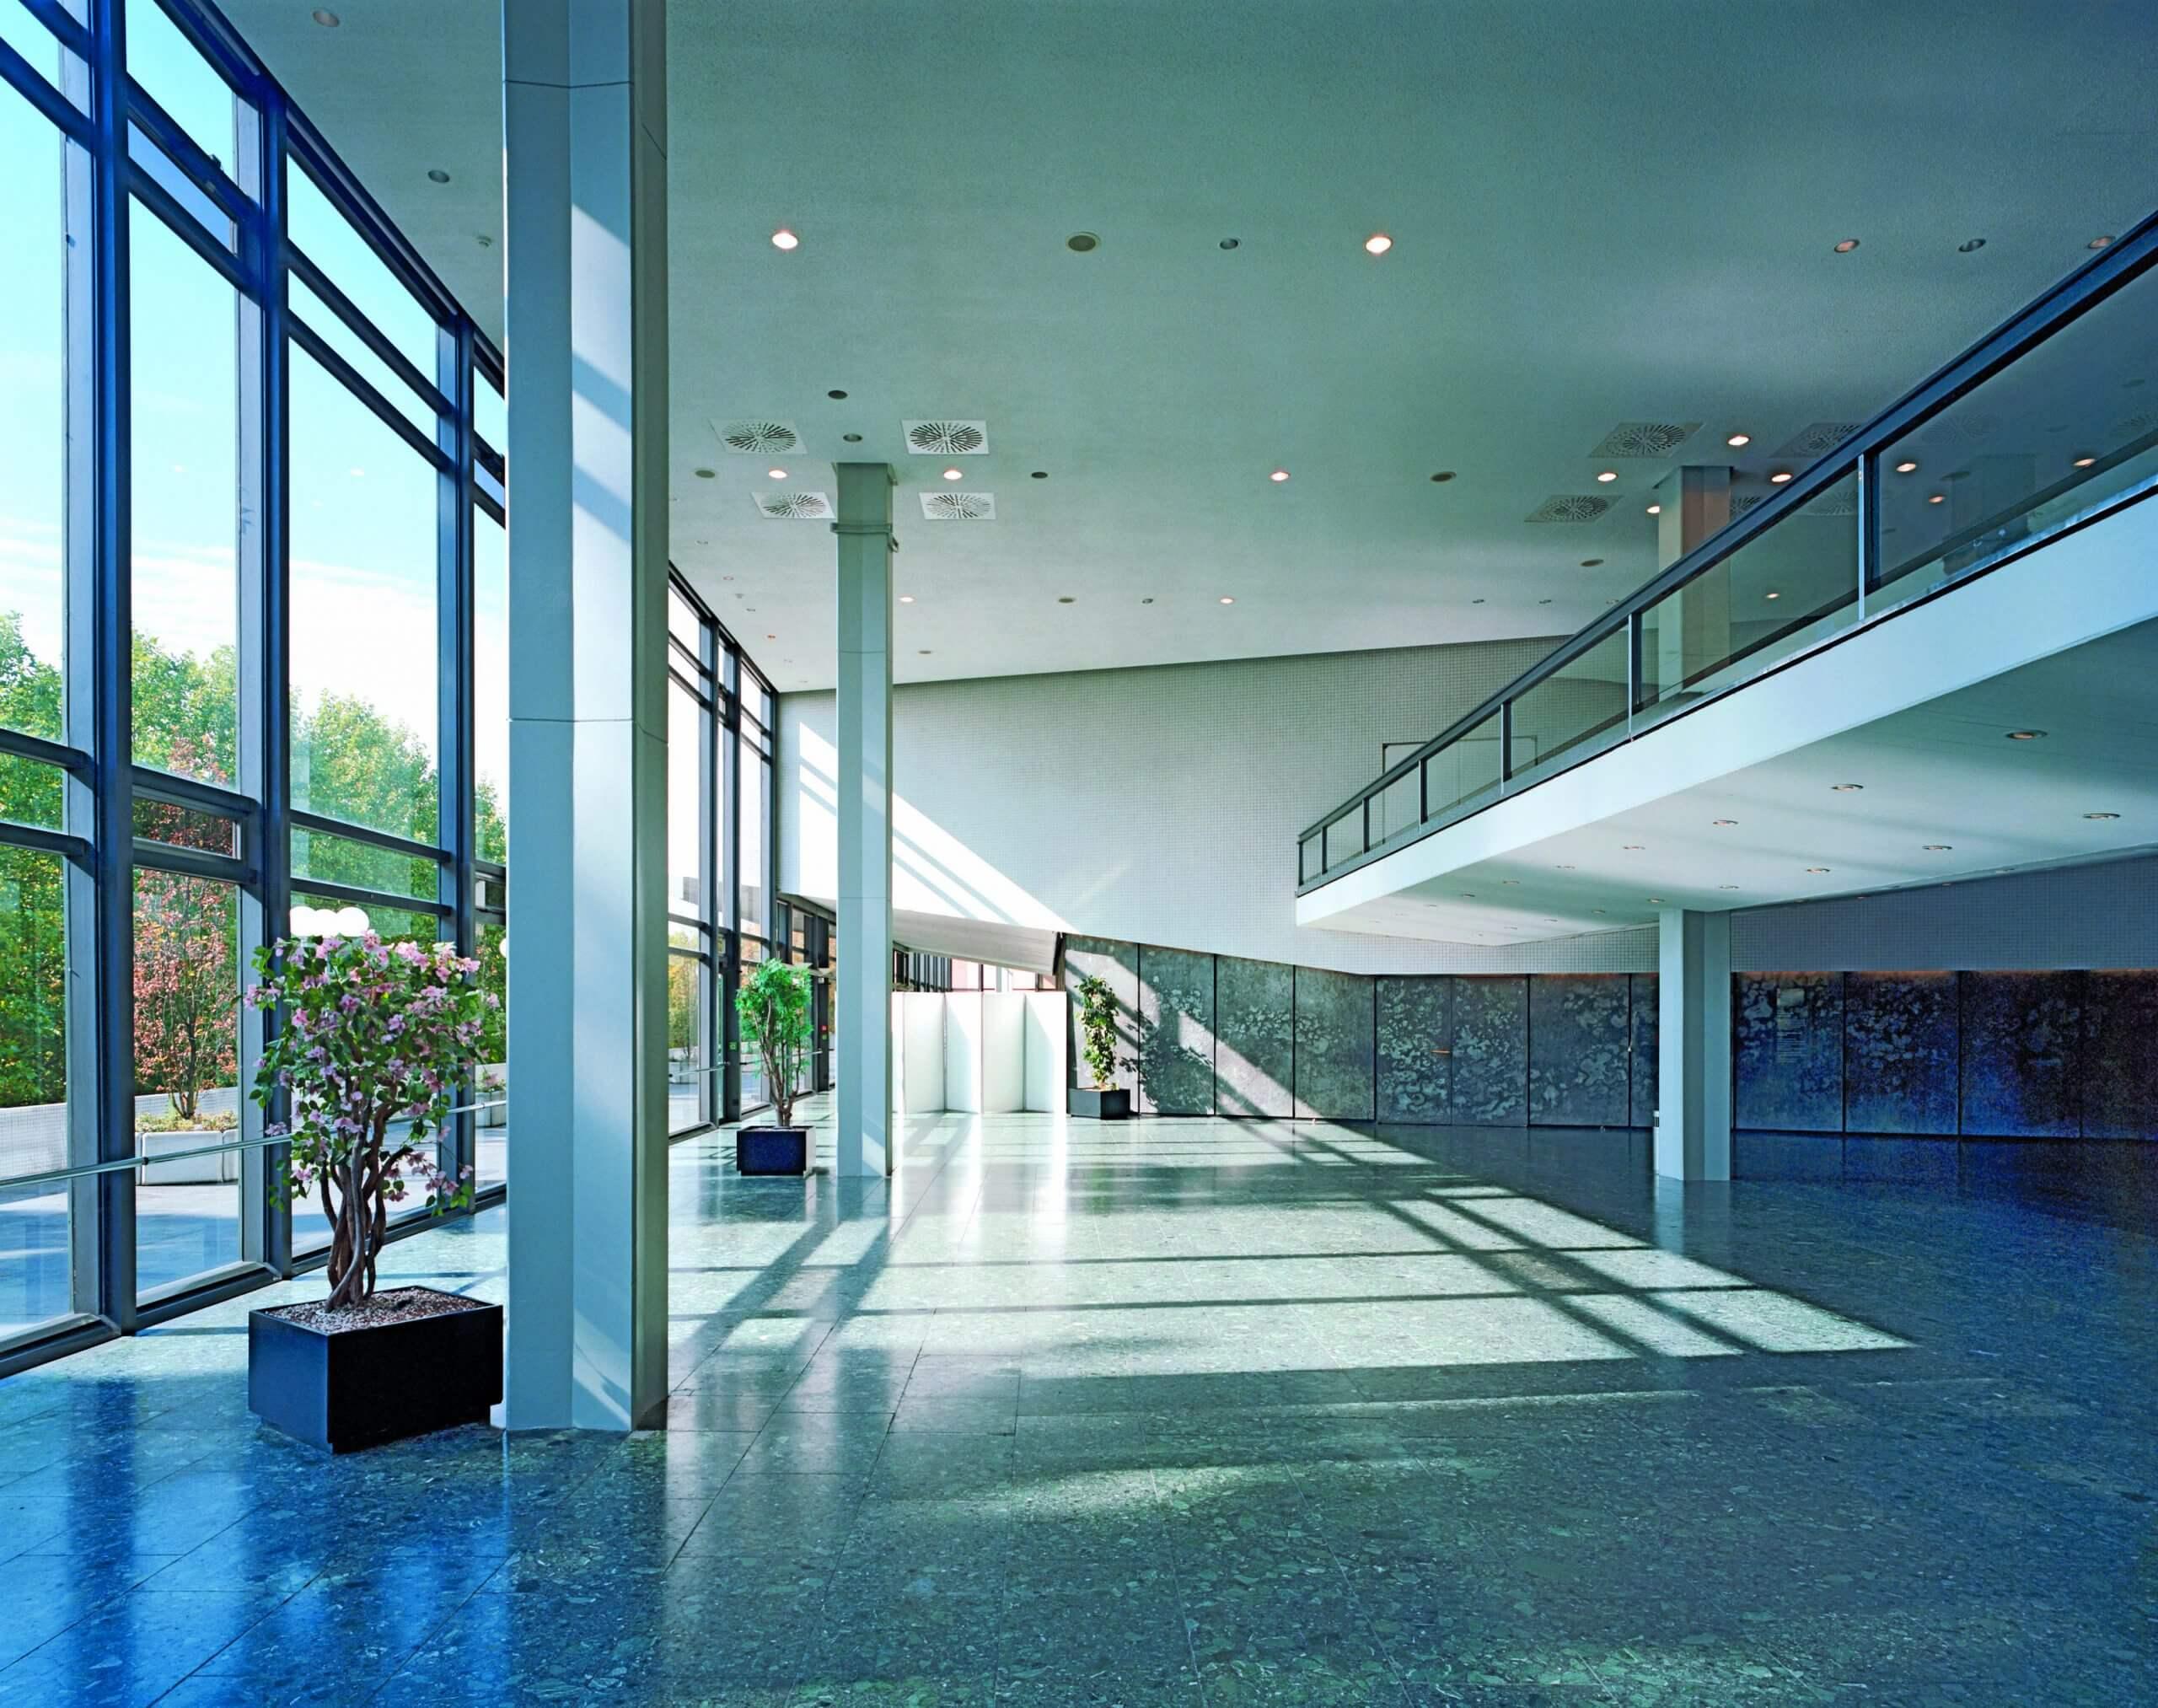 Grosses Foyer Ost in der Congresshalle Festerfront zur Saar